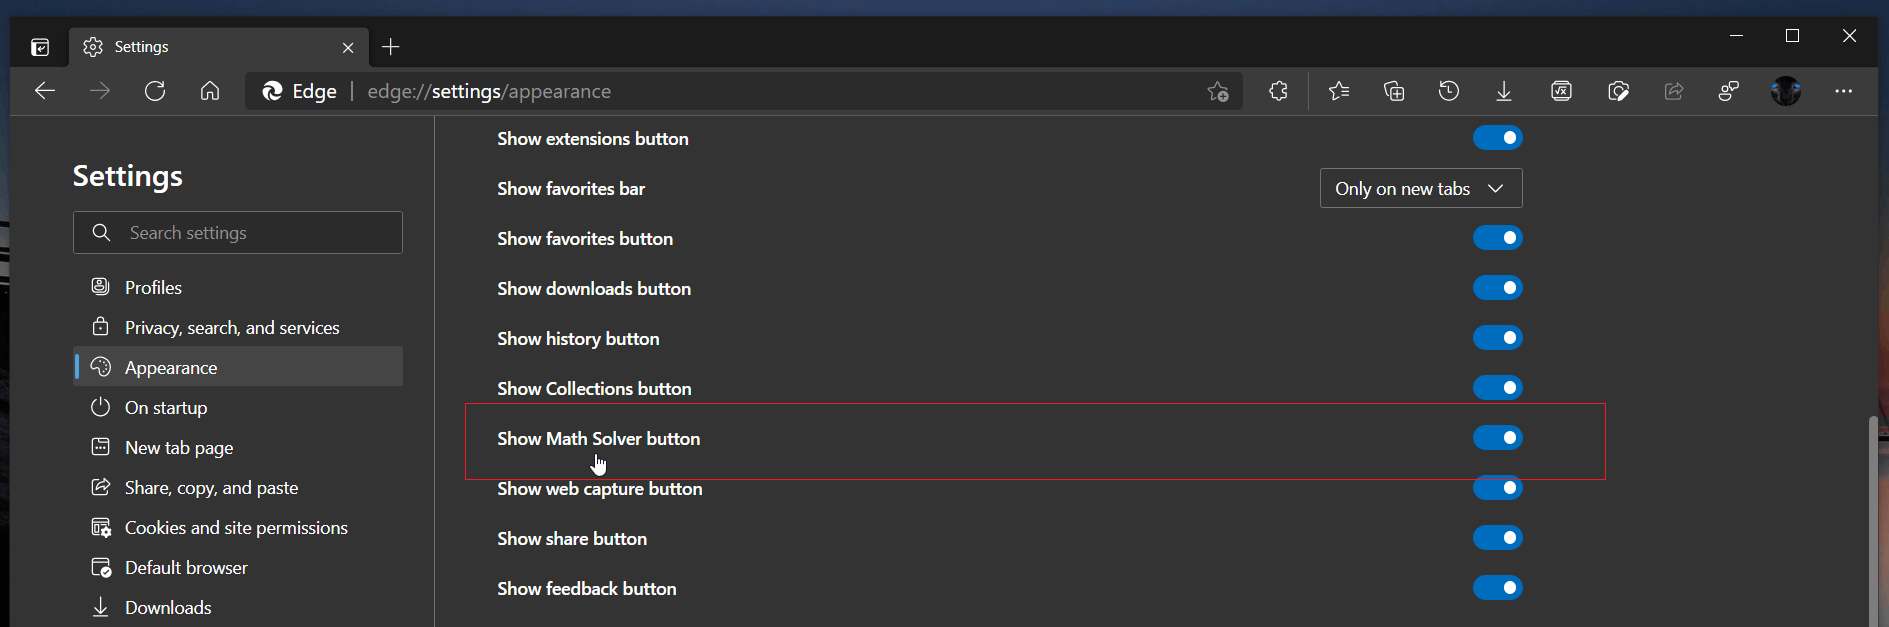 Add Math Solver Button In Edge